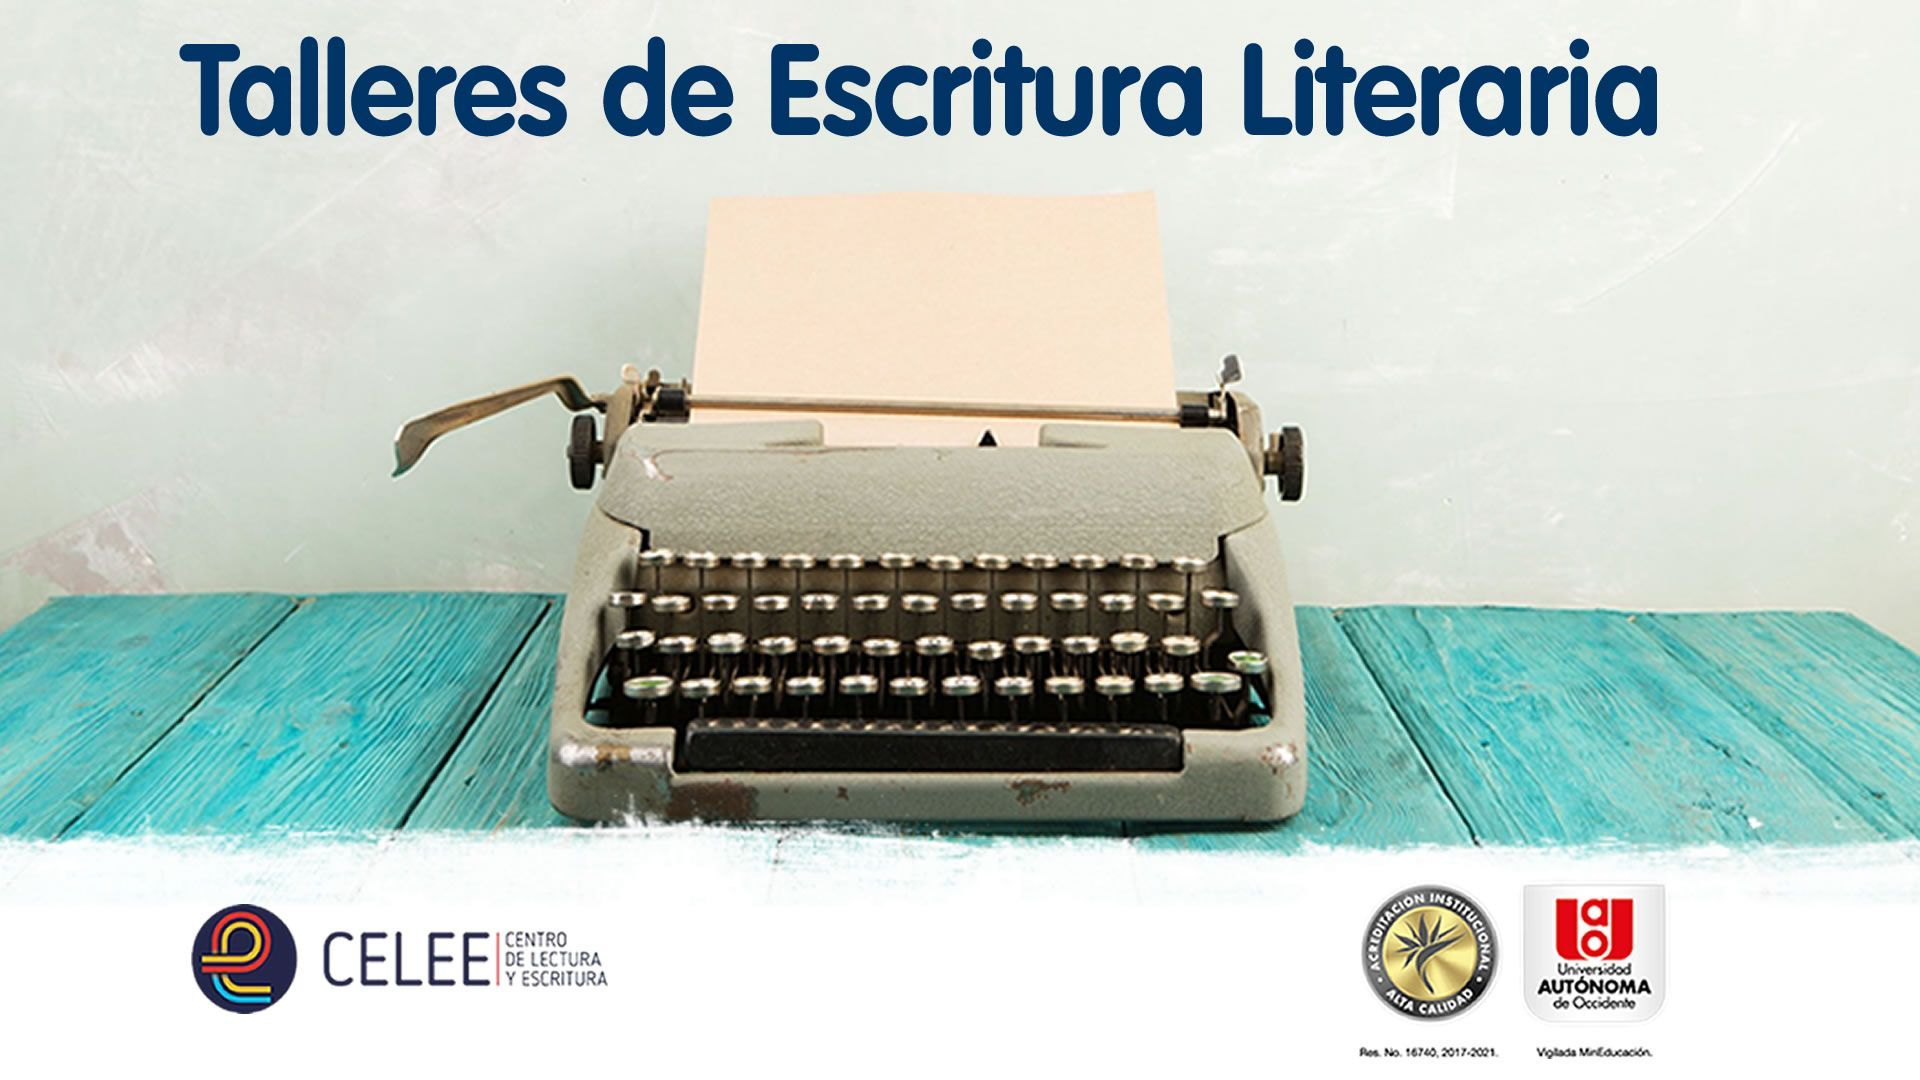 taller de escritura literaria banner web_export